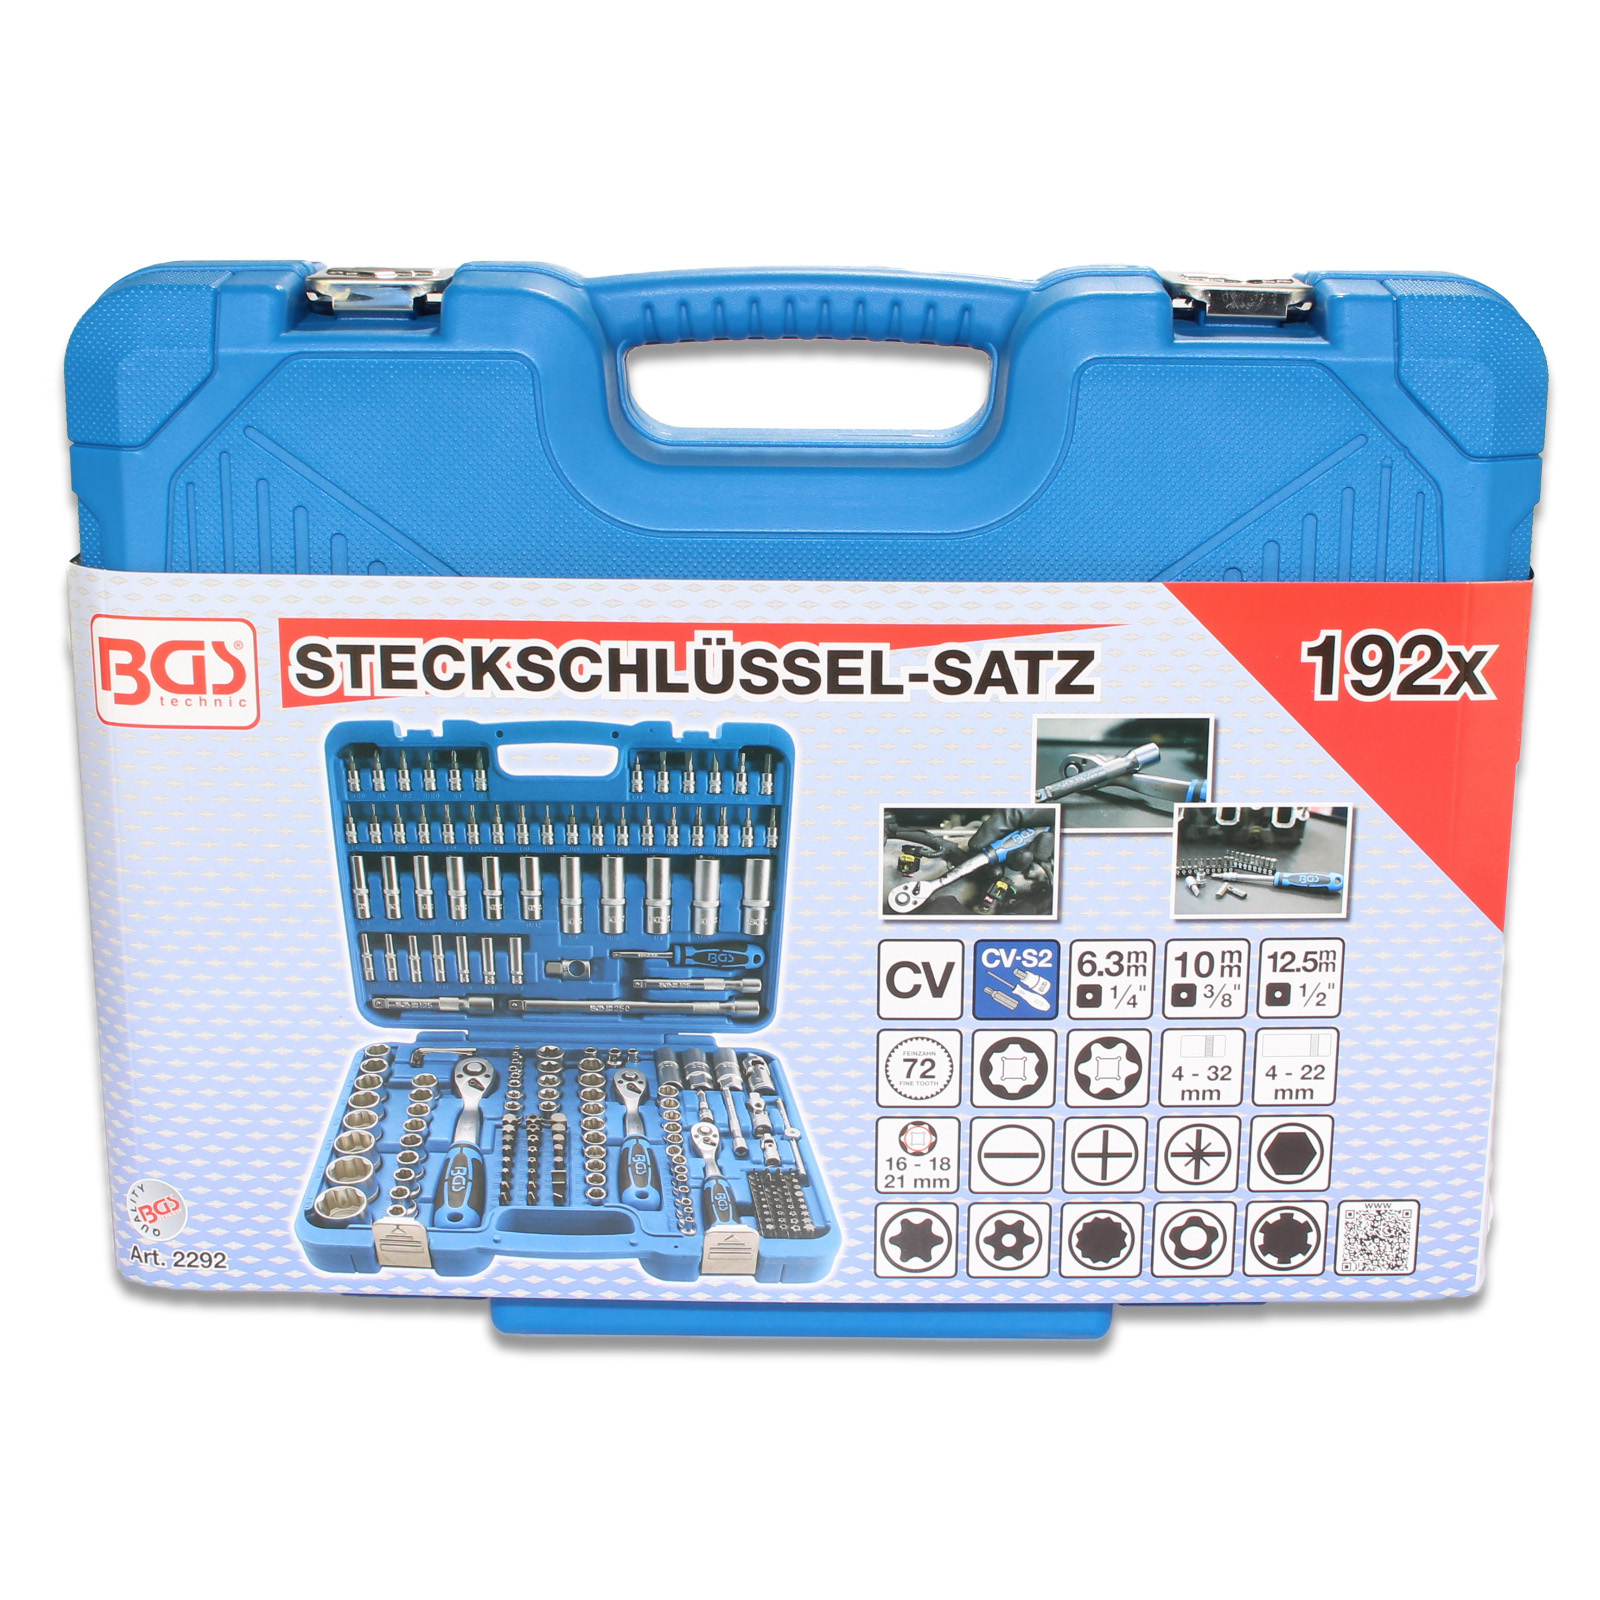 BGS Steckschlüsselsatz 2292